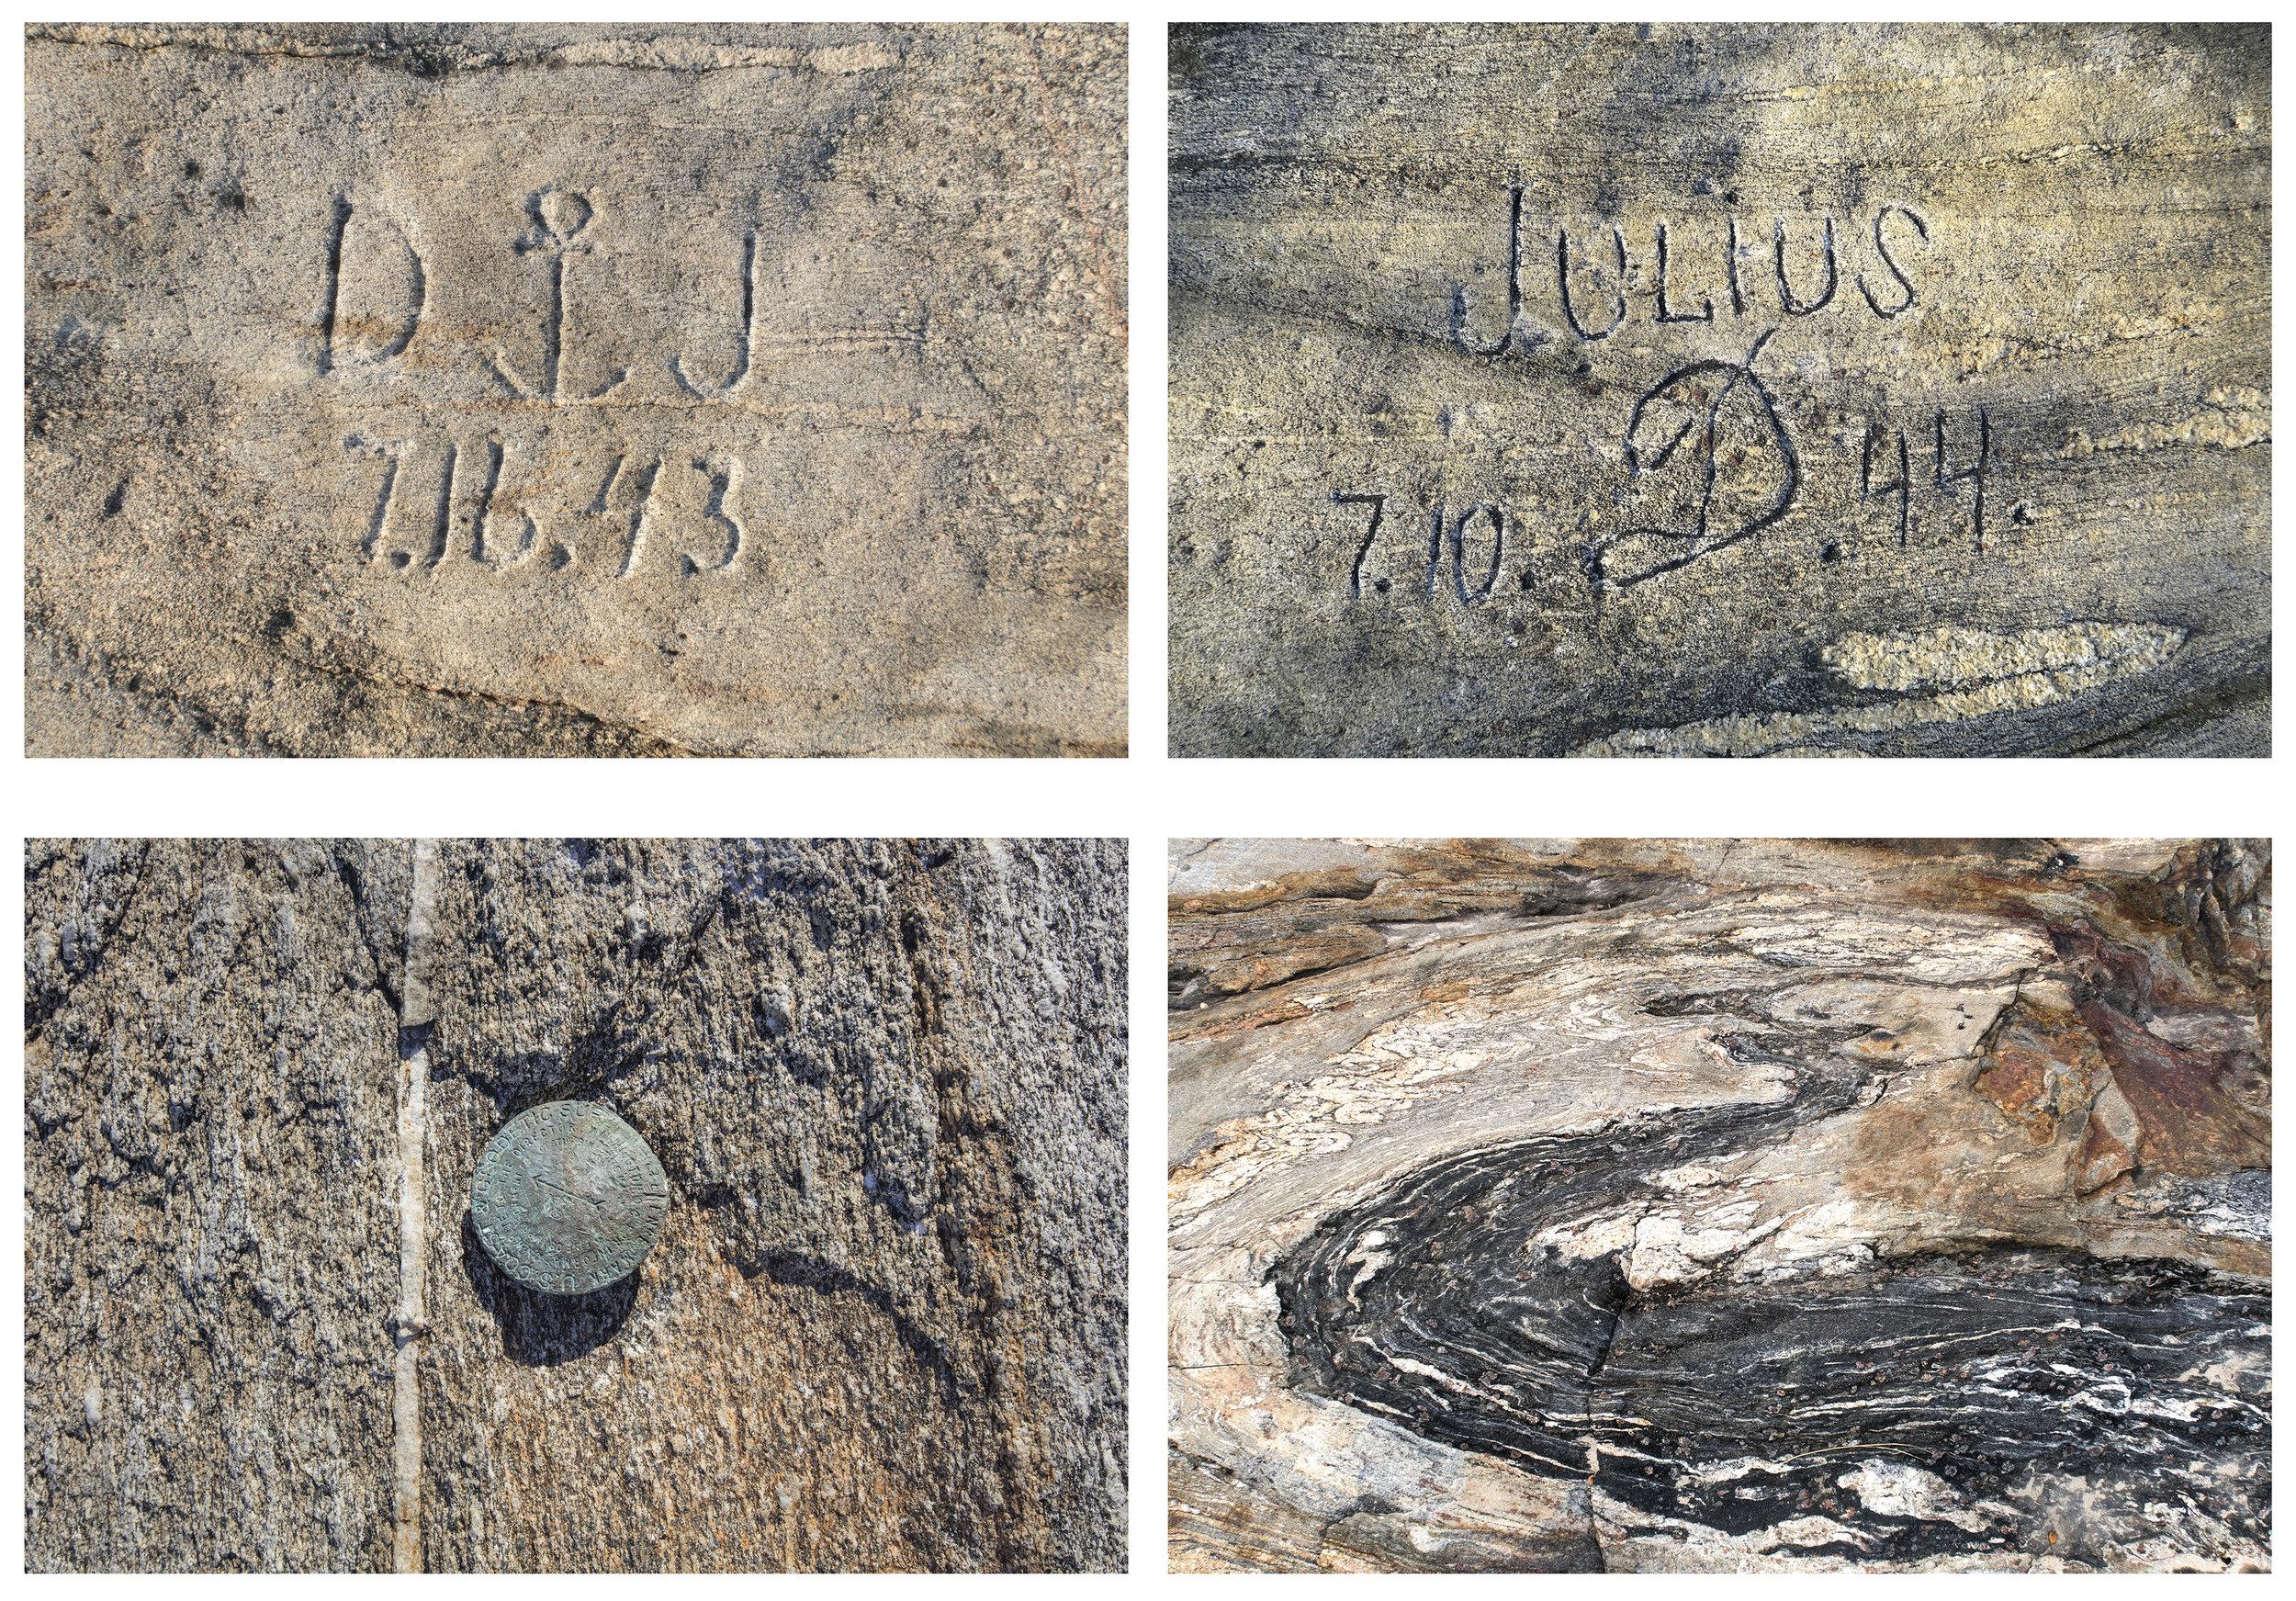 DJ 7.16.43, Julius D 7.10.44, Bronze Marker, Stone Flow.jpg